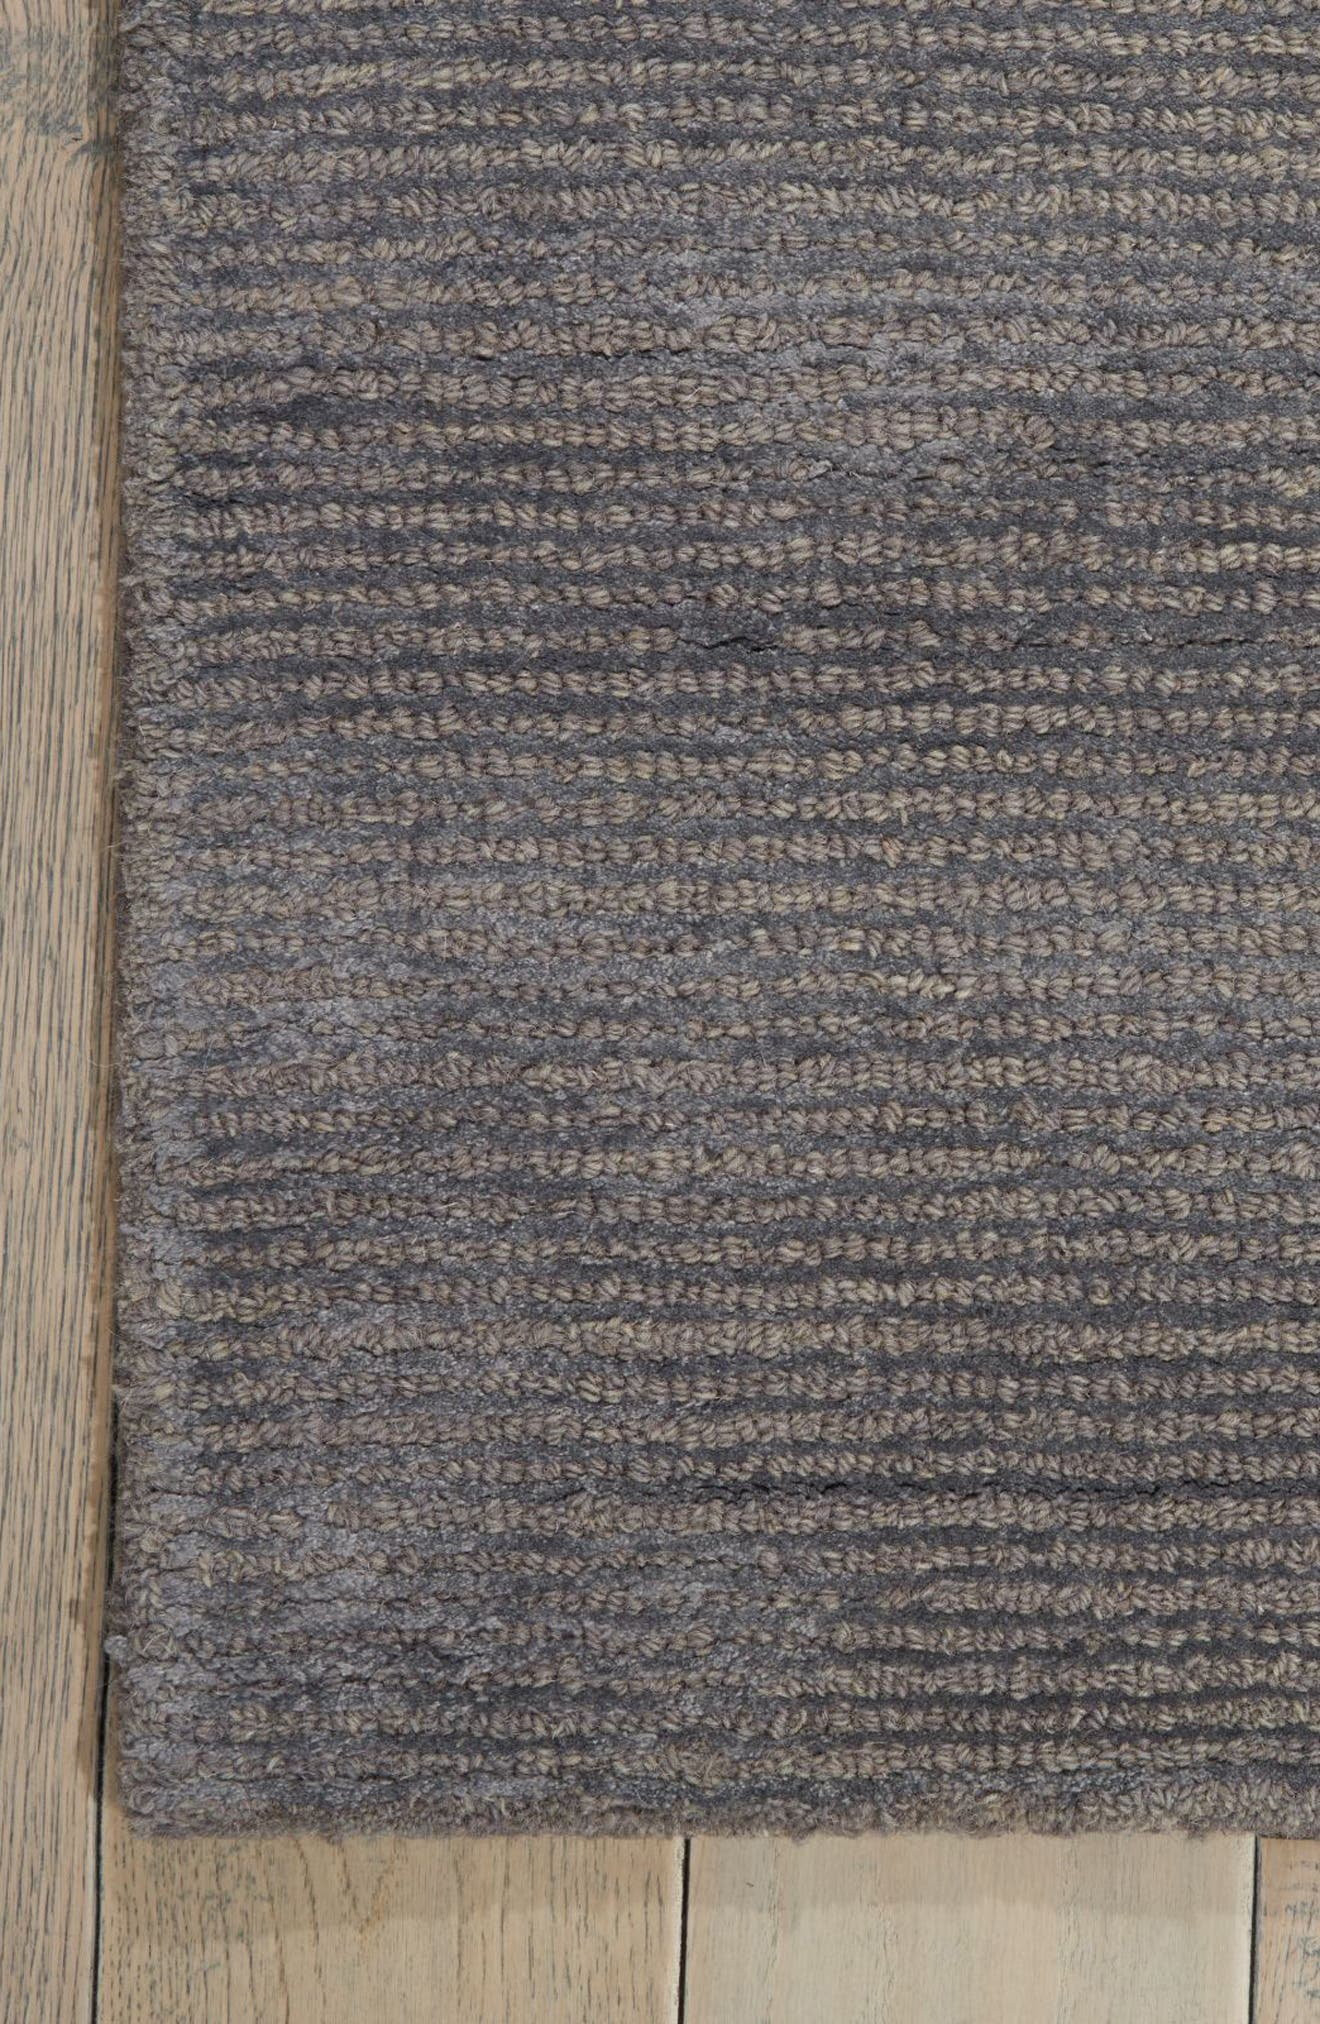 Ravine Furrow Handwoven Area Rug,                             Alternate thumbnail 4, color,                             Dusk